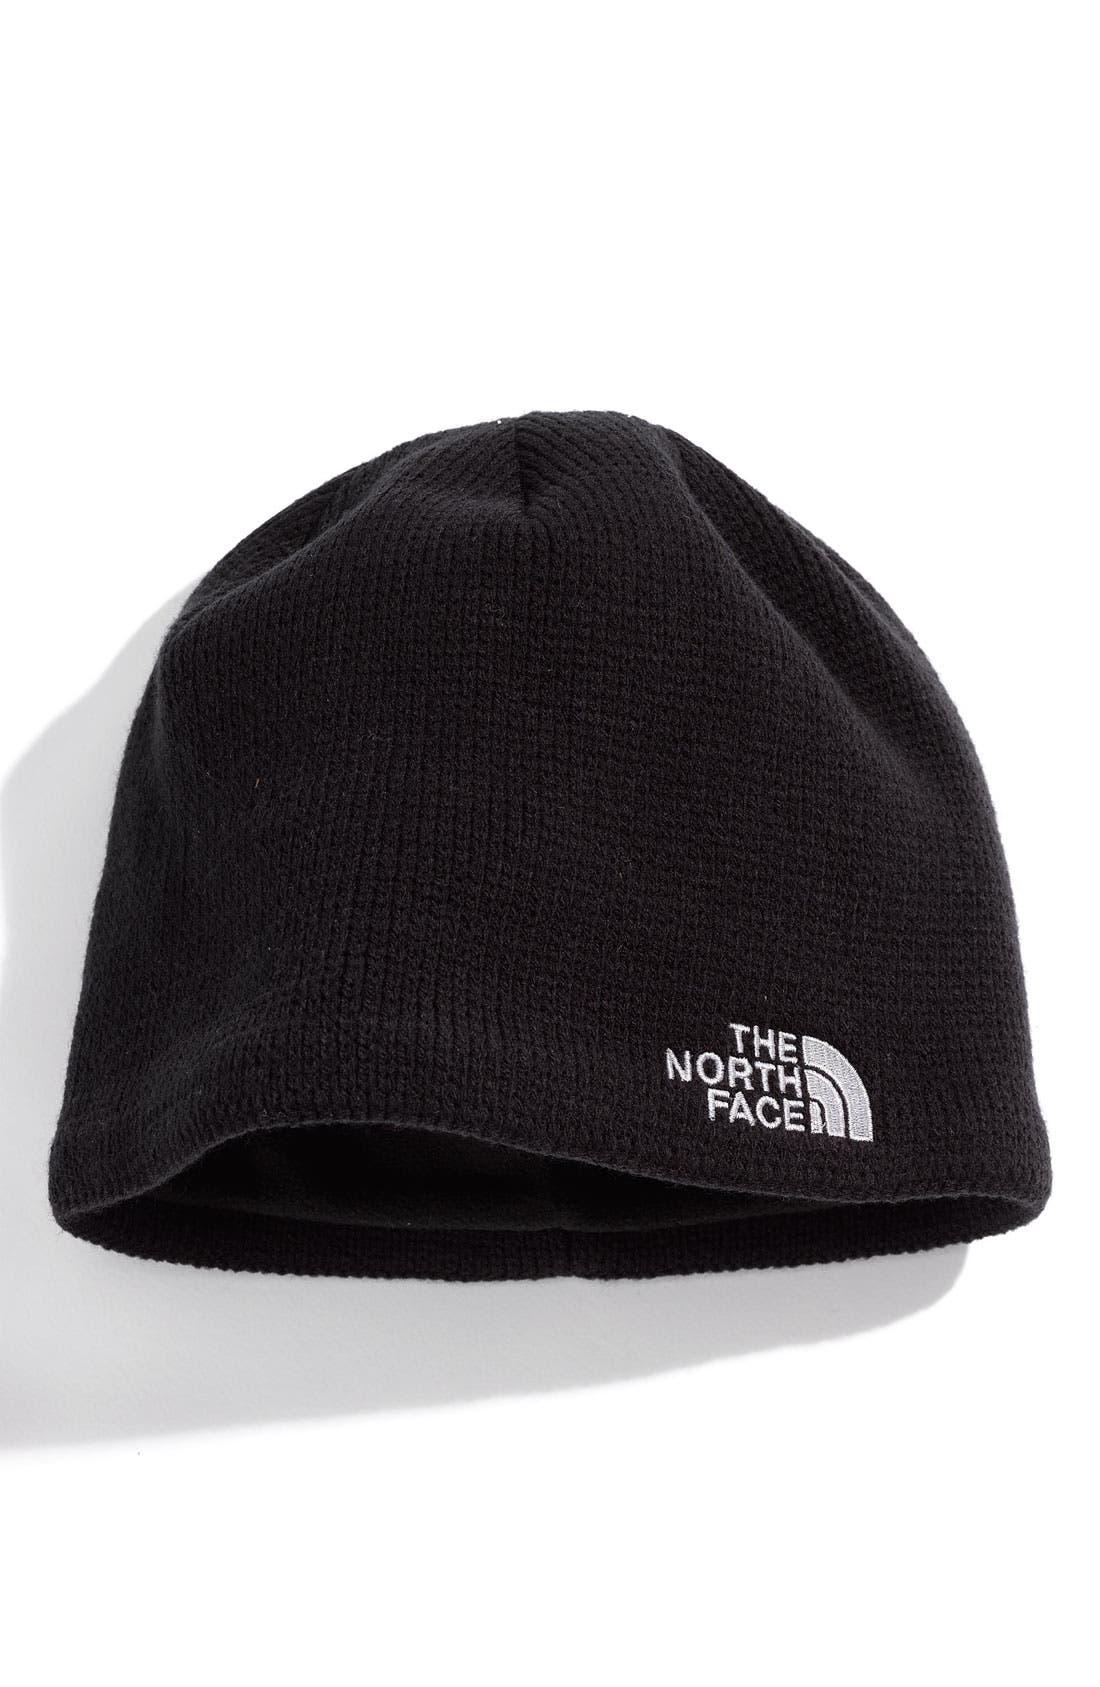 Main Image - The North Face 'Bones' Microfleece Beanie